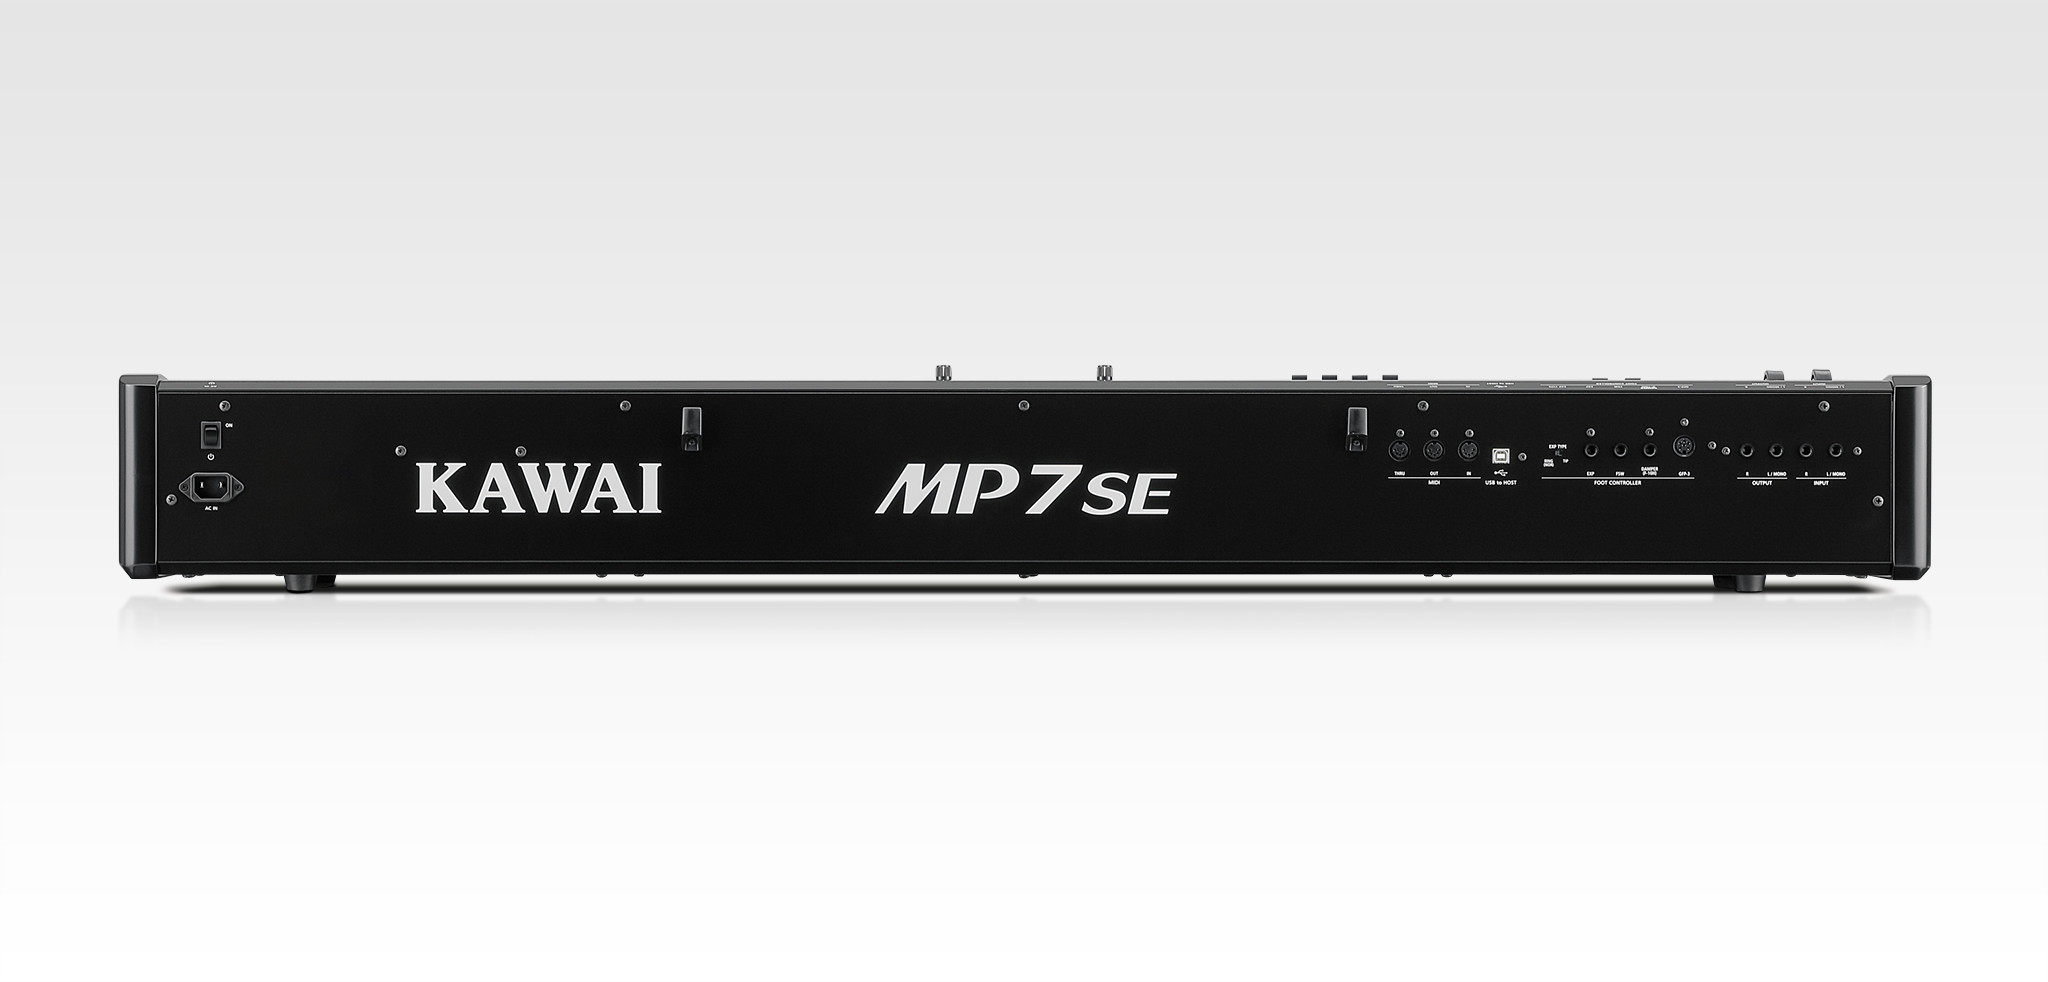 MP7SE